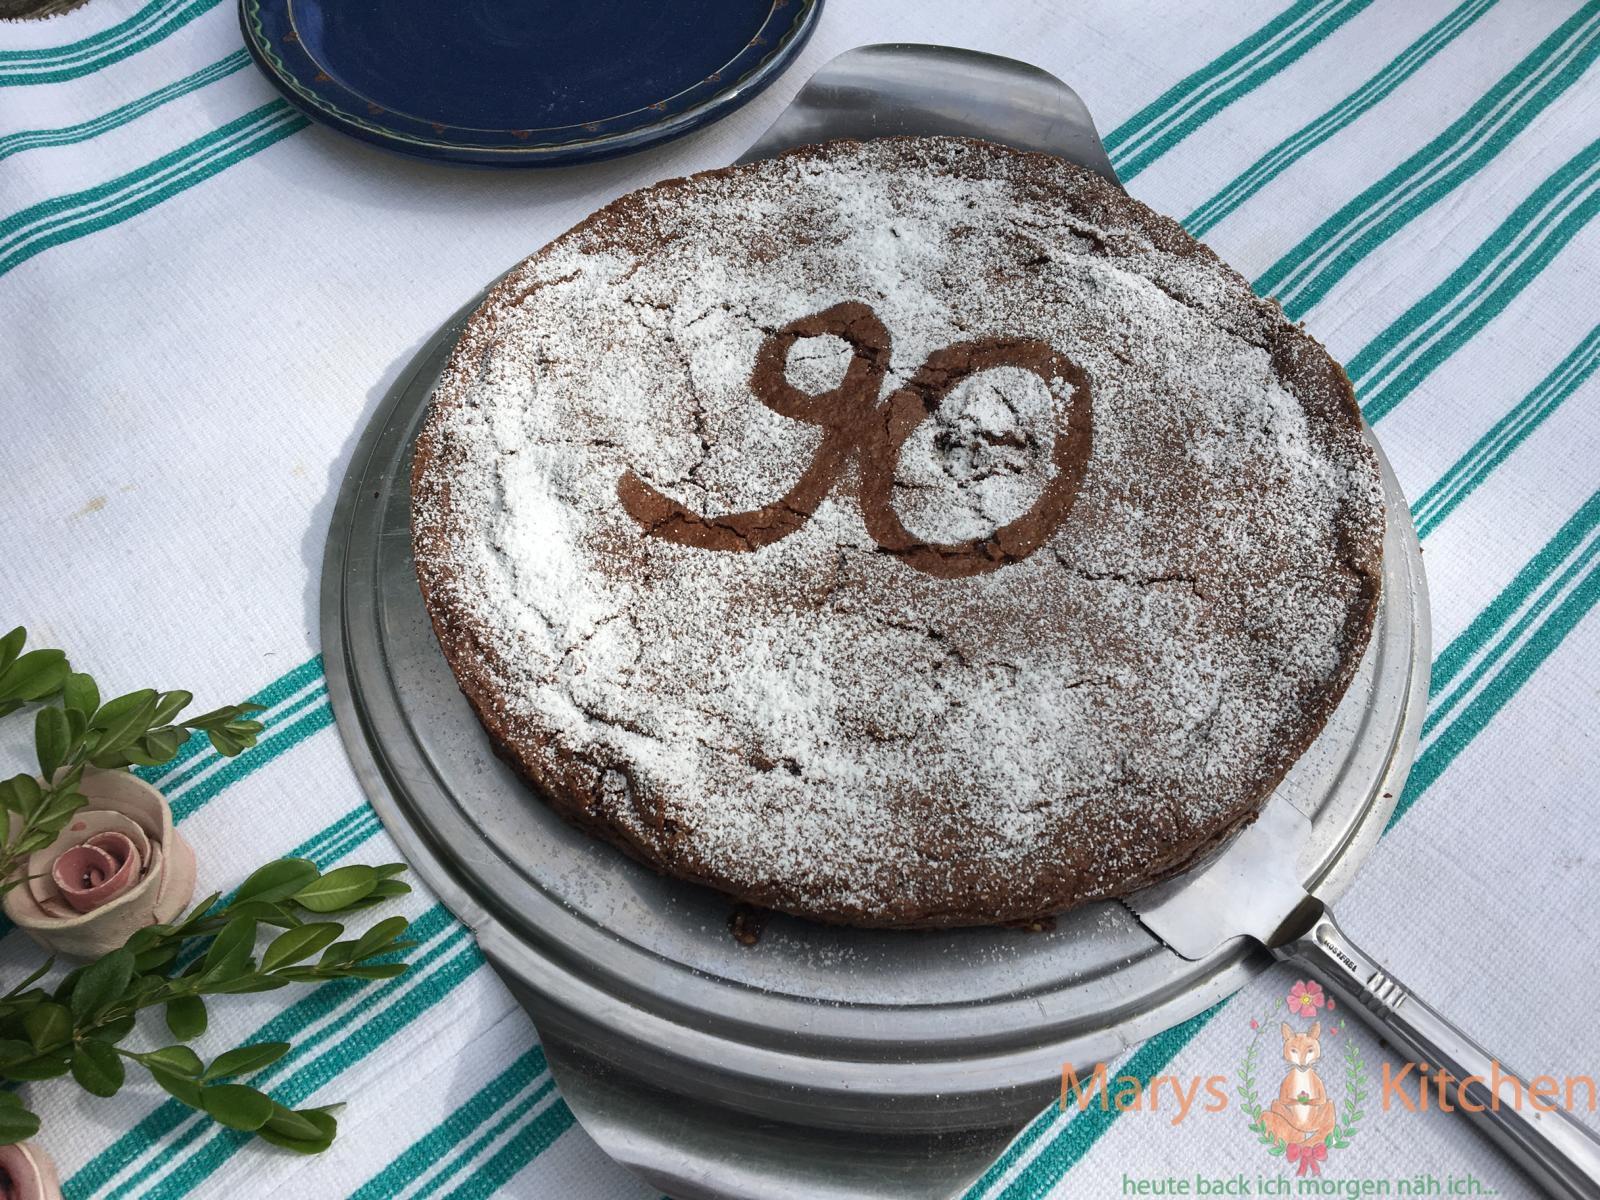 torta-caprese-rezept-bester-schokoladenkuchen-italienisch-1